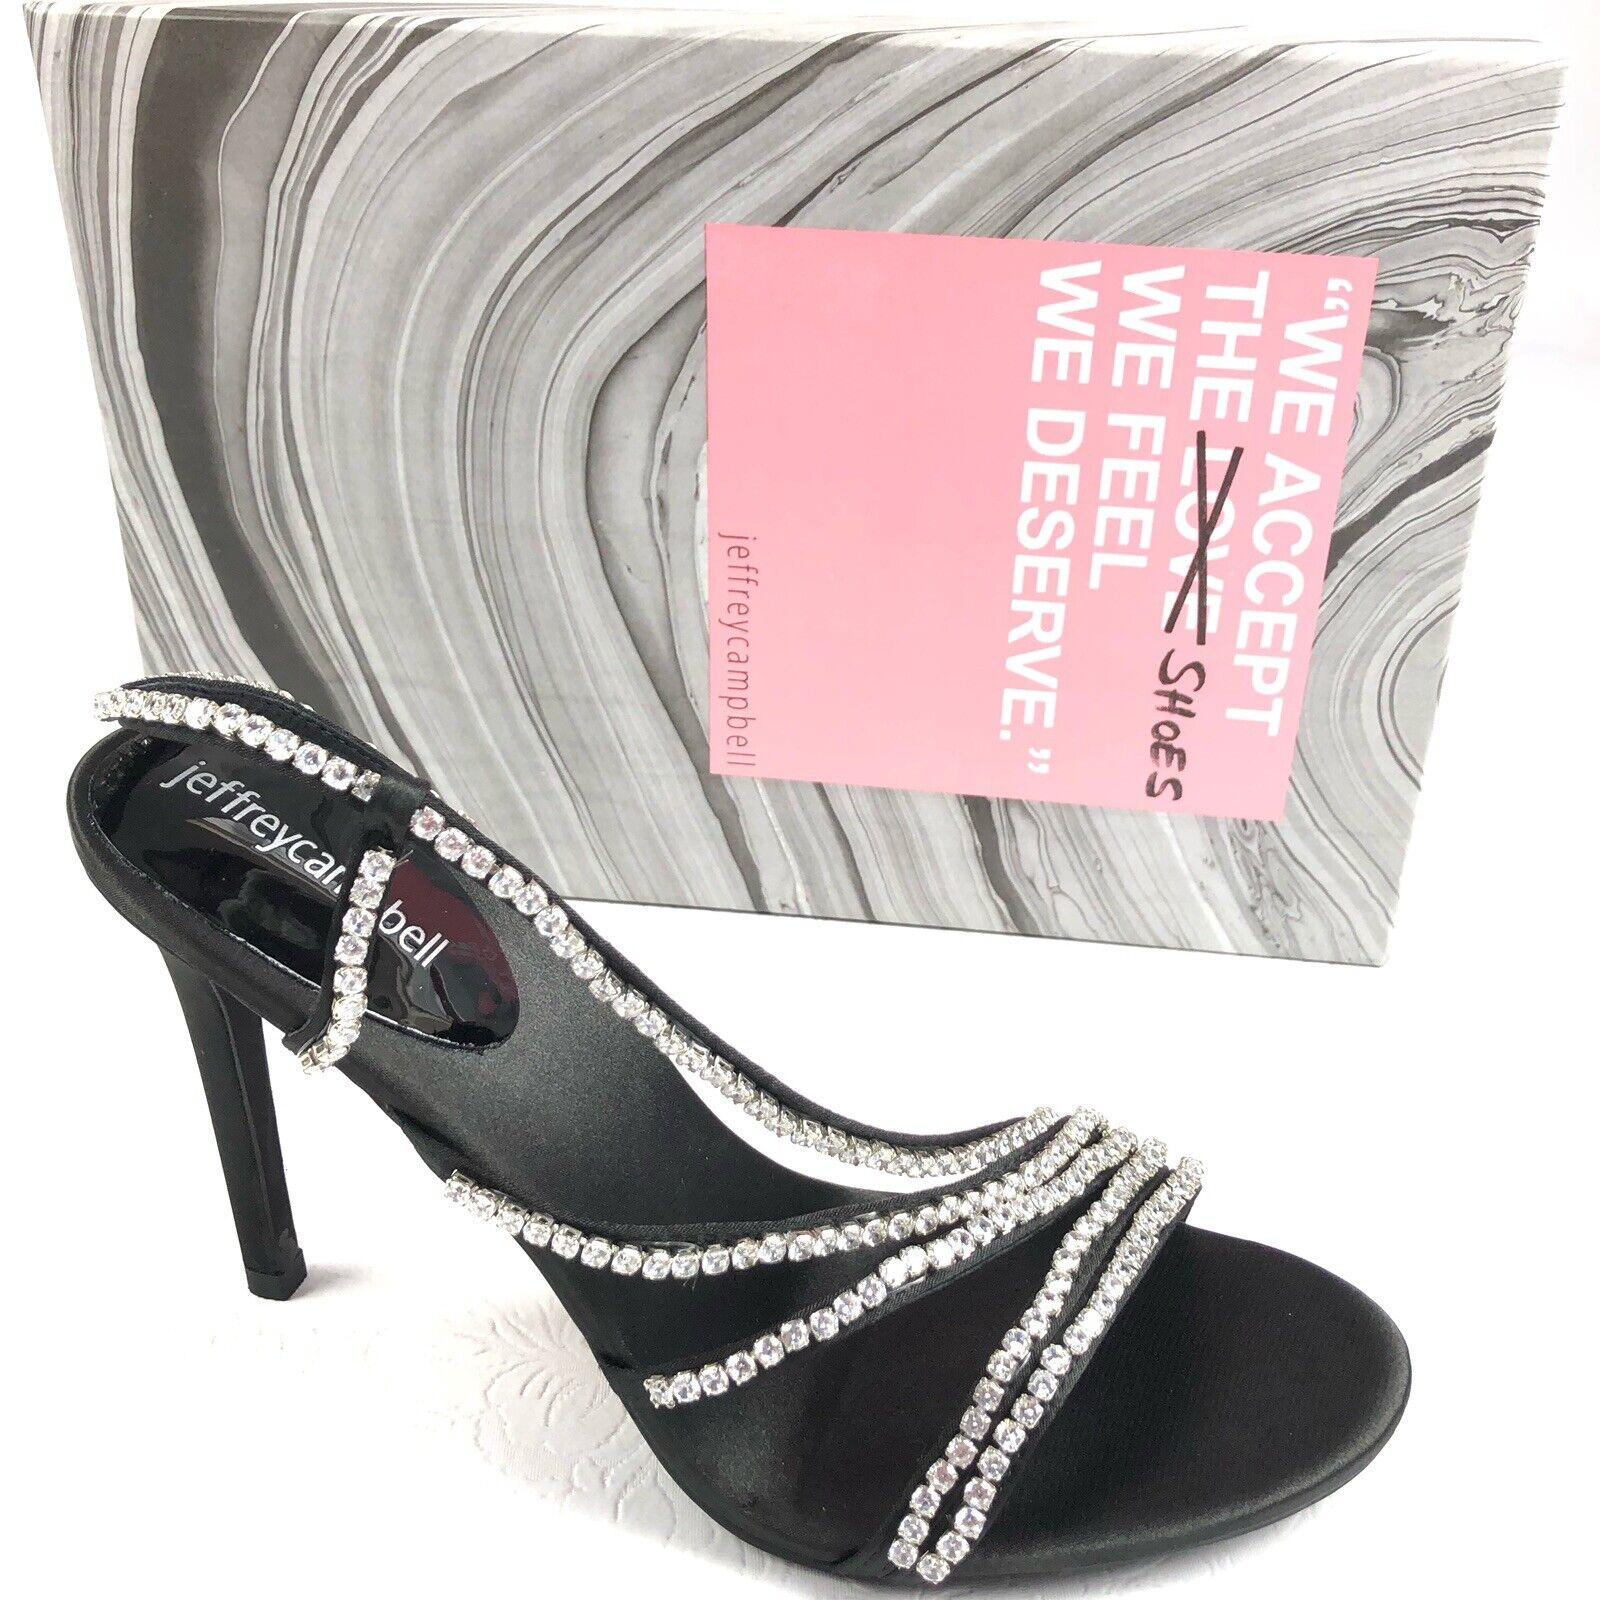 JEFFREY CAMPBELL Lilian embellished strappy sandals 8 M black satin heels prom